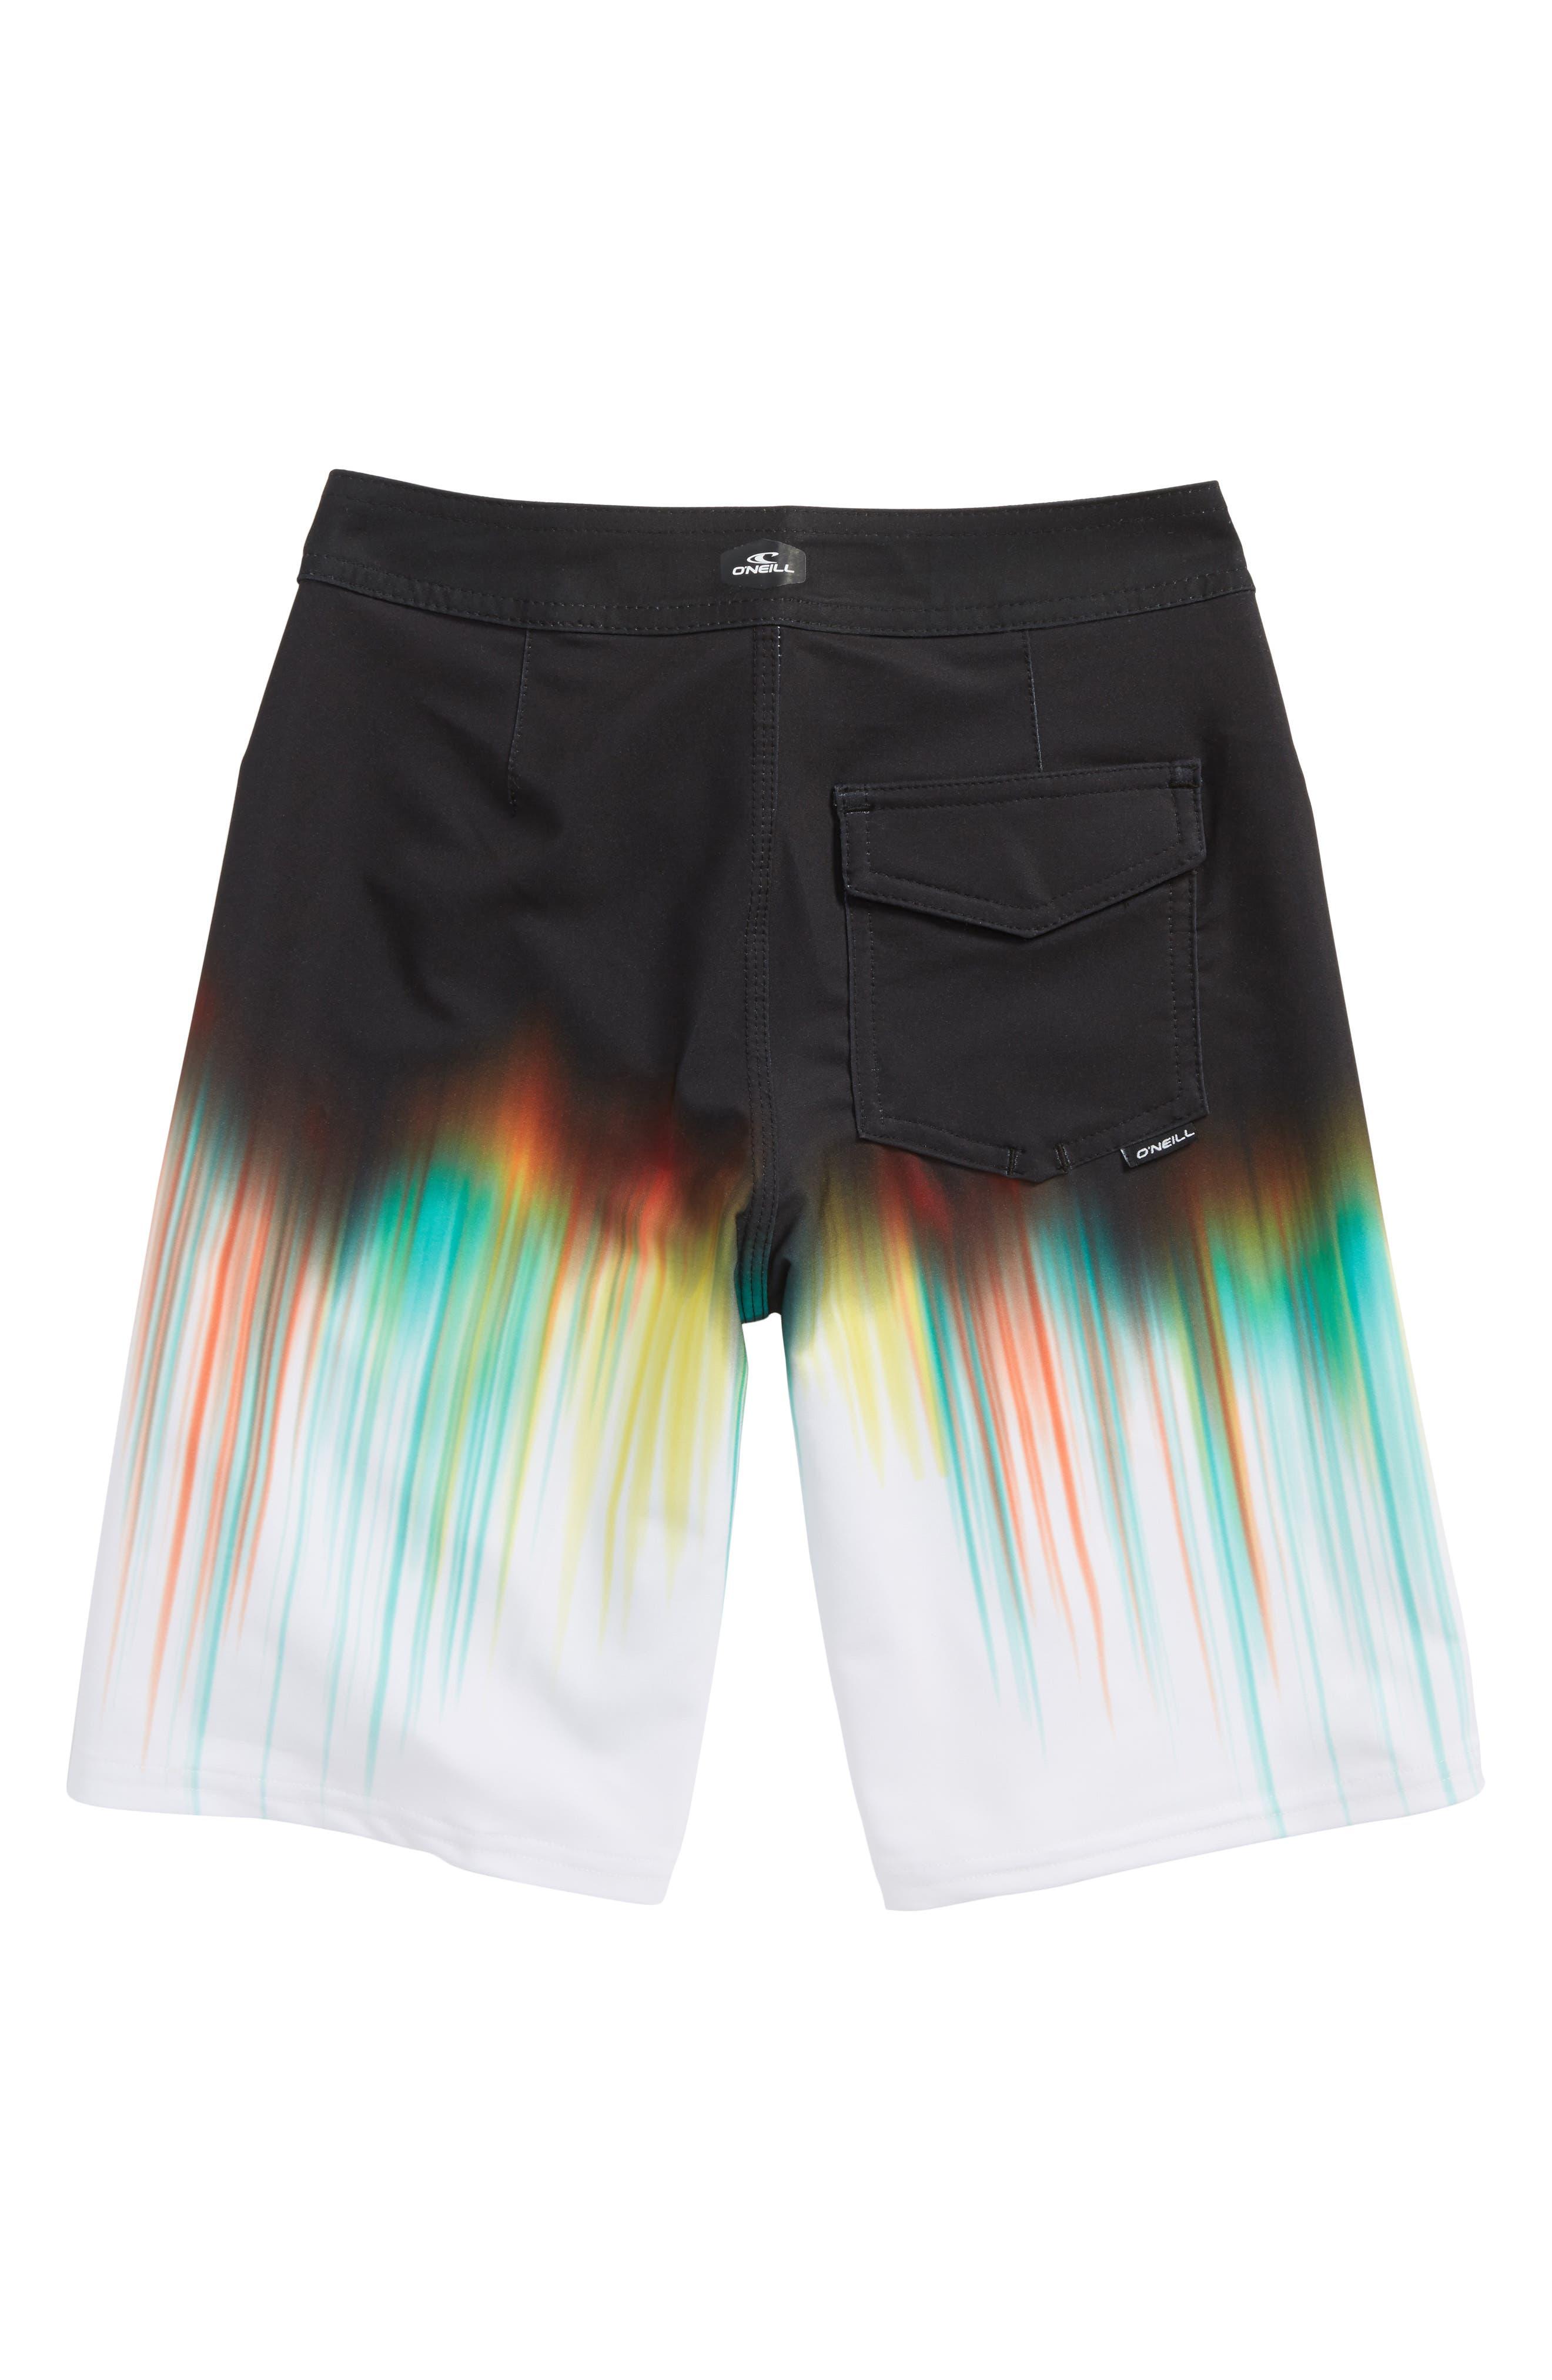 Hyperfreak Drippin Board Shorts,                             Alternate thumbnail 2, color,                             001